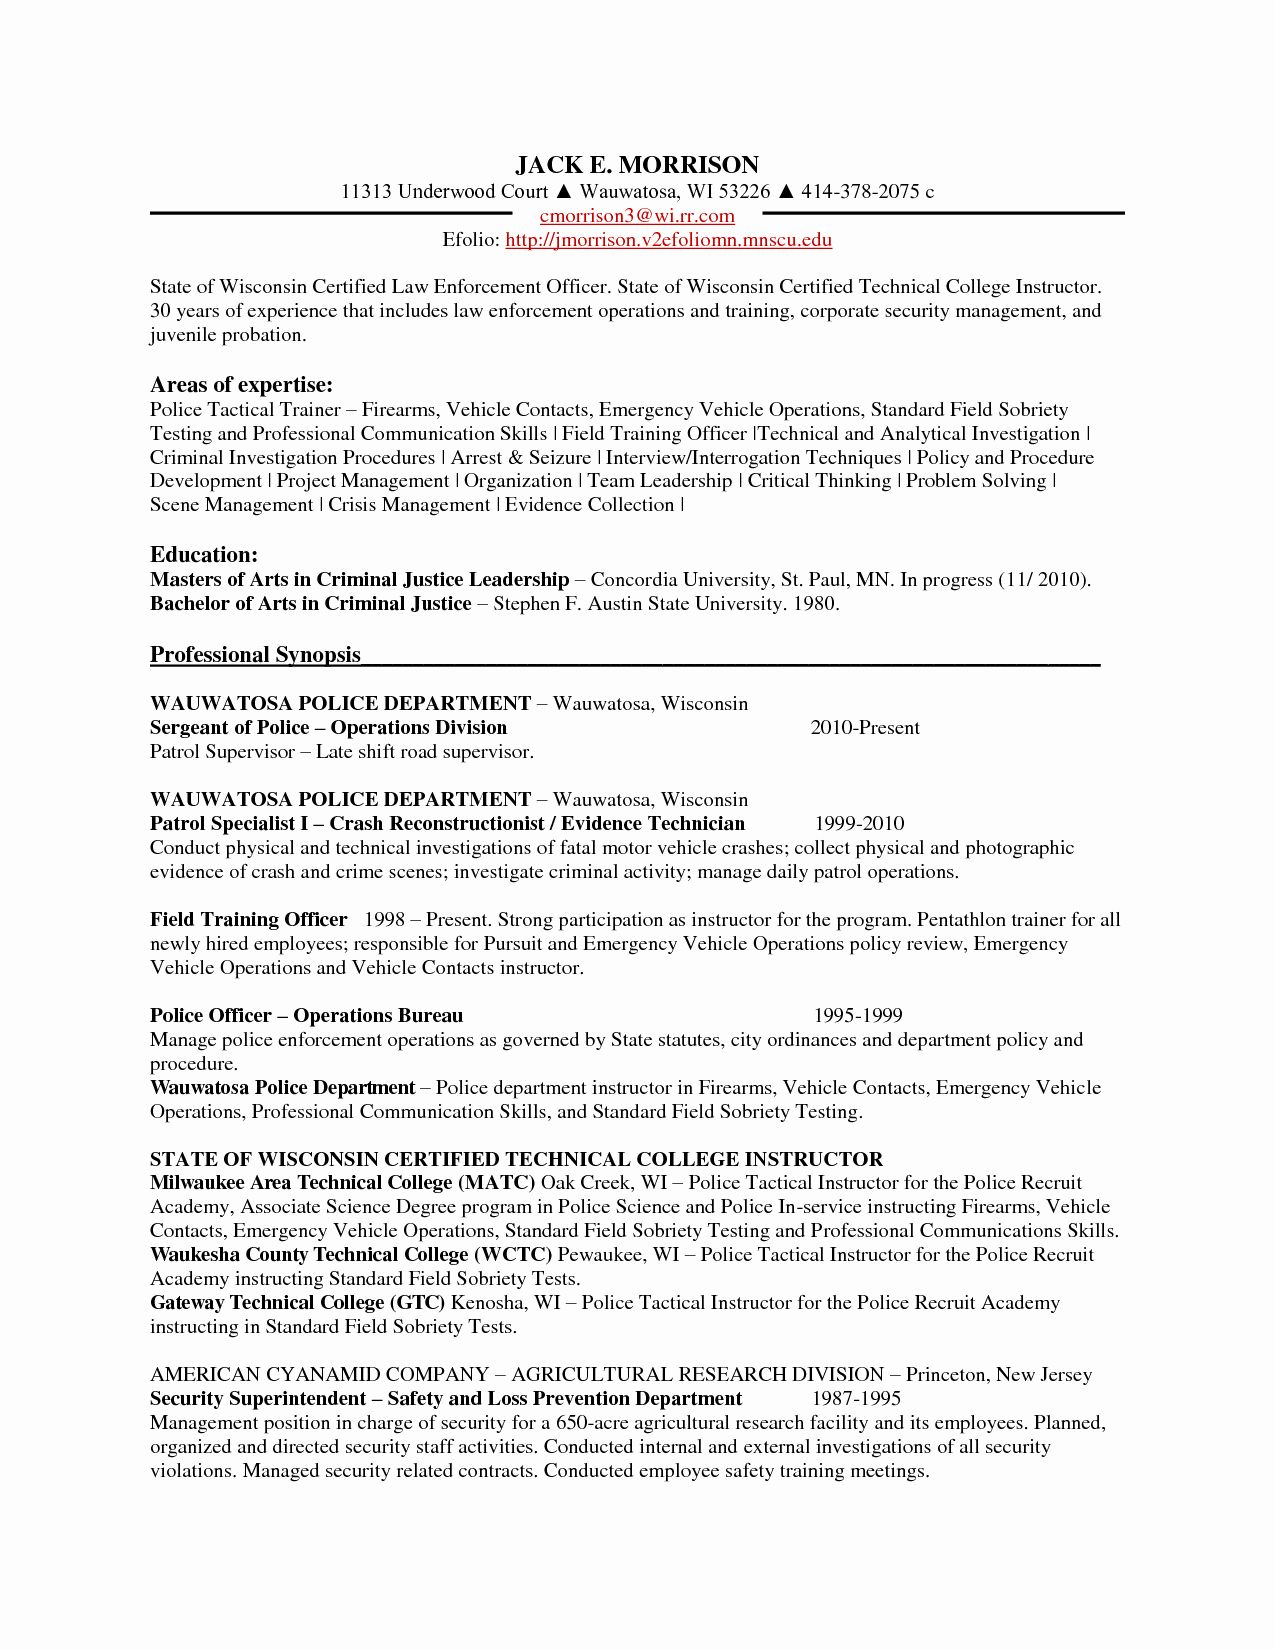 Military police job description resume best of police